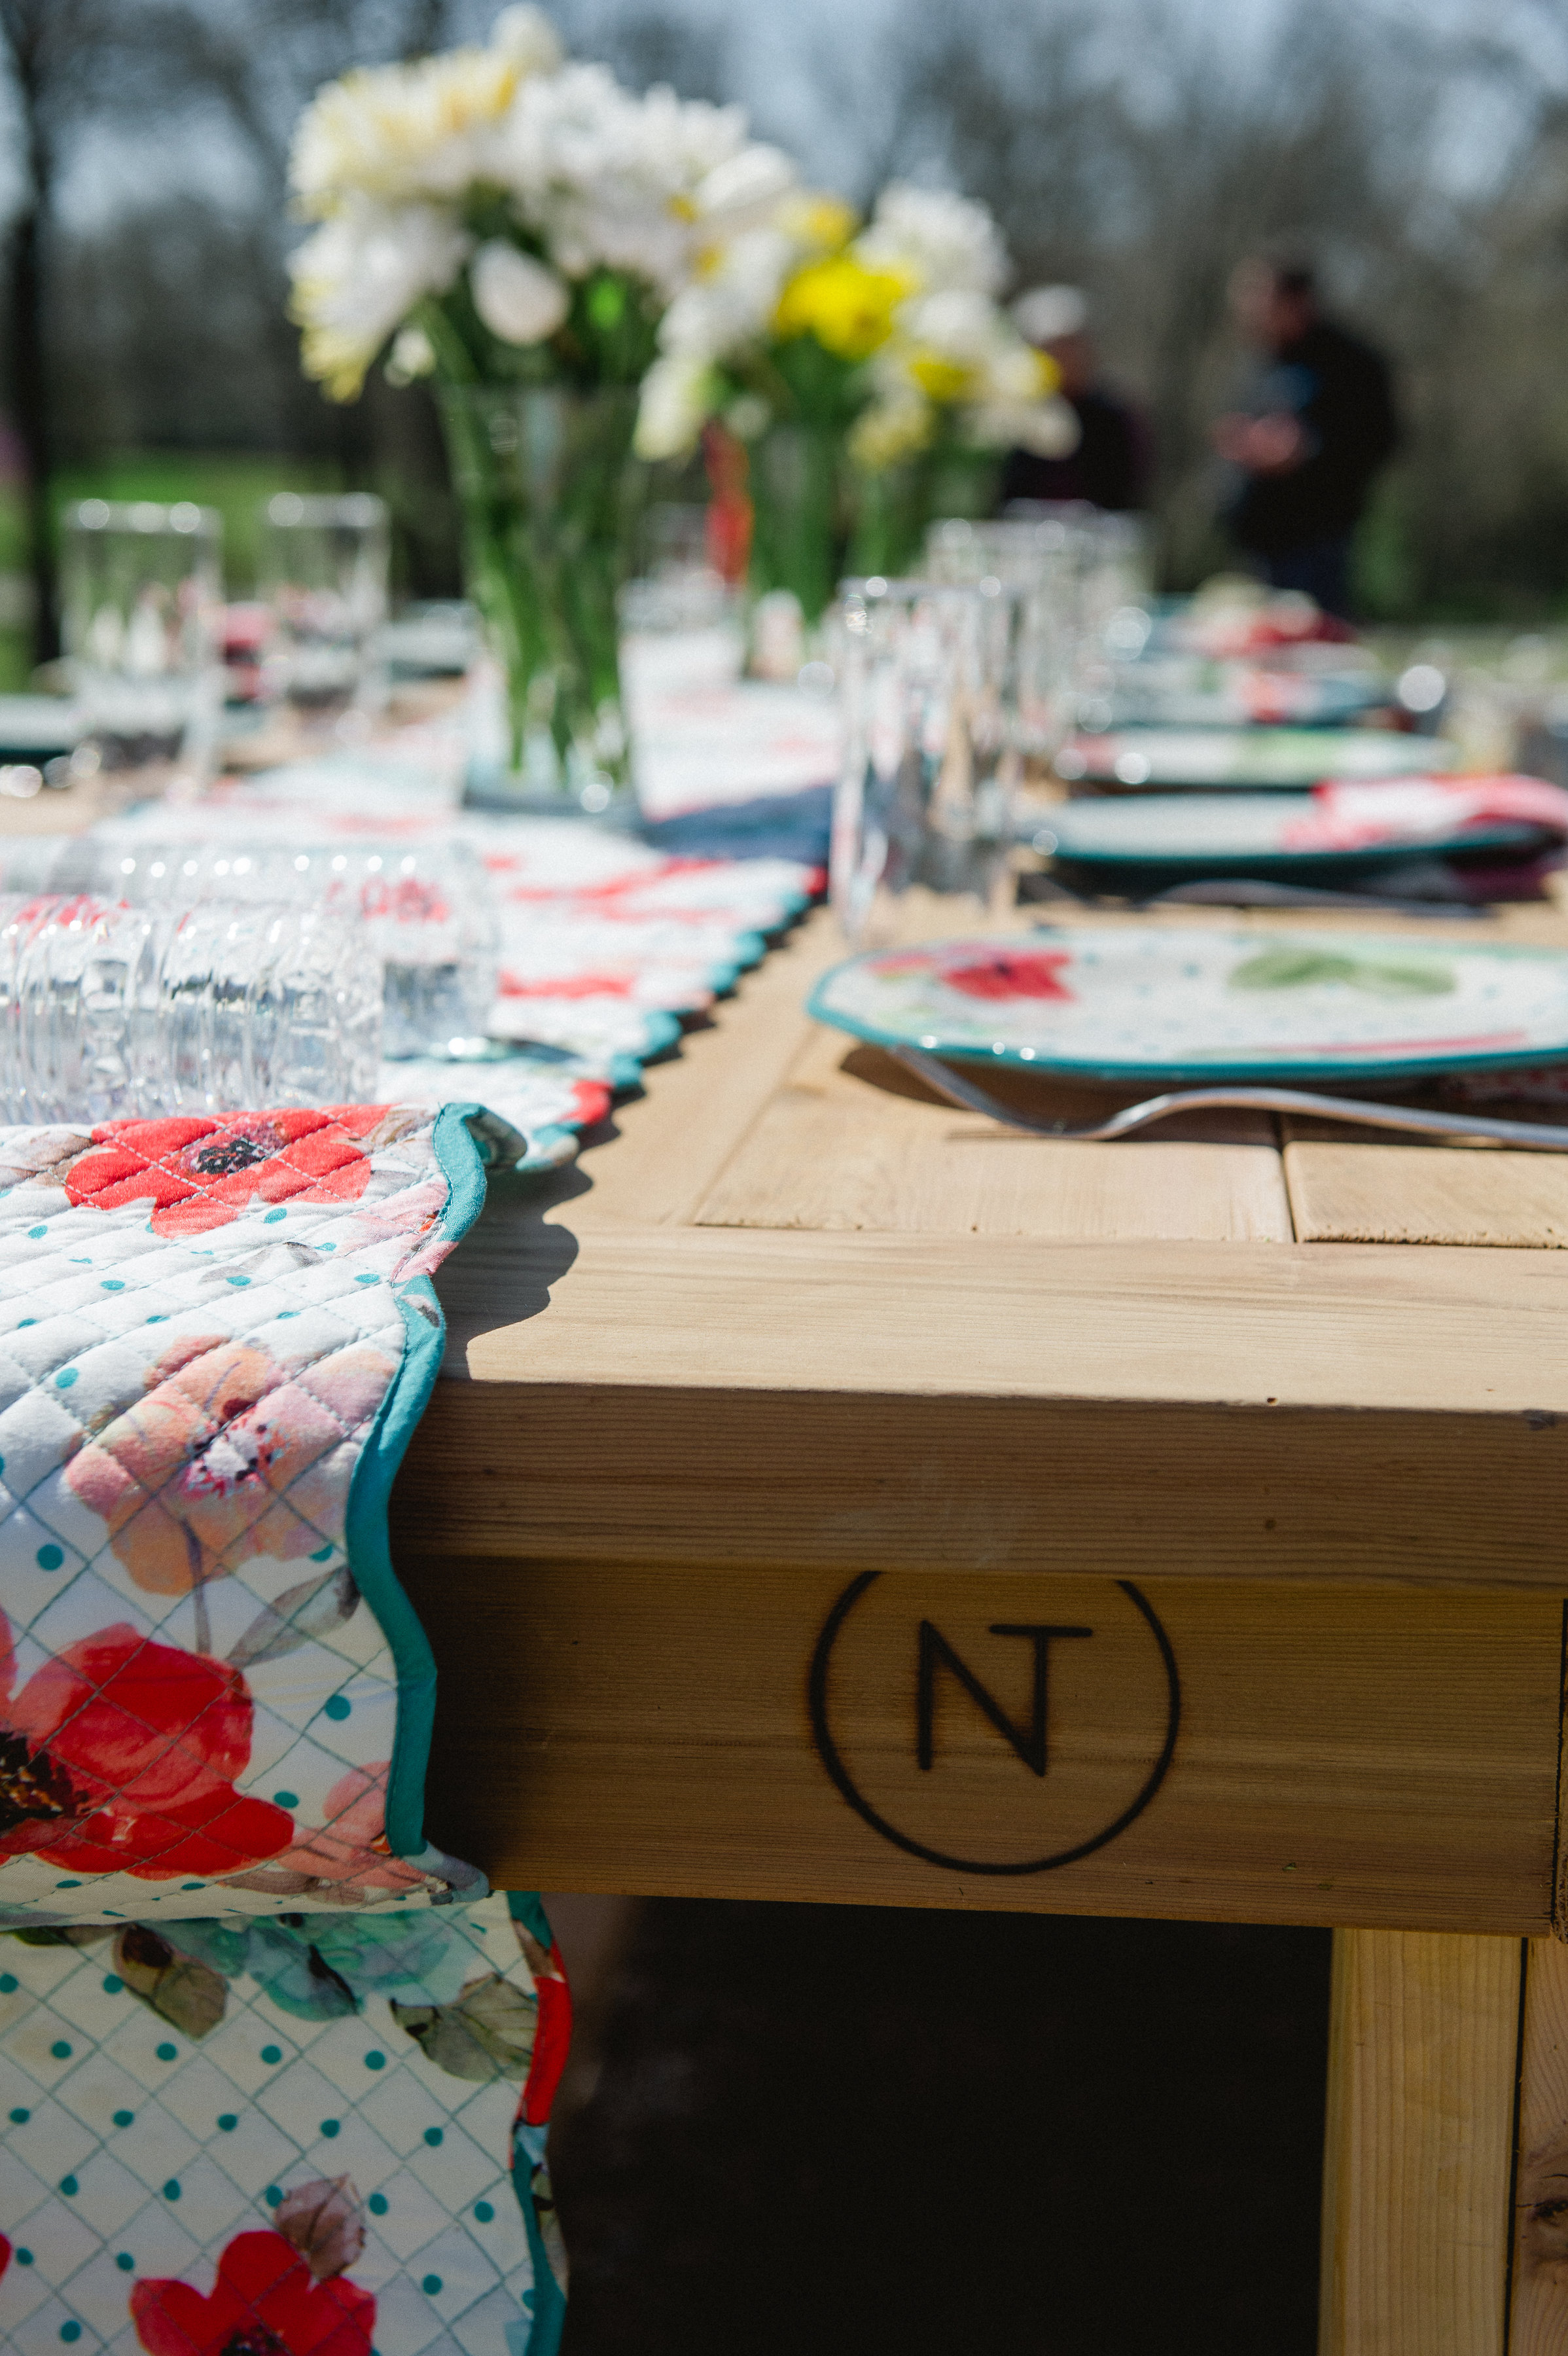 Neighbor's Table in Druid Hills Charlotte, NC